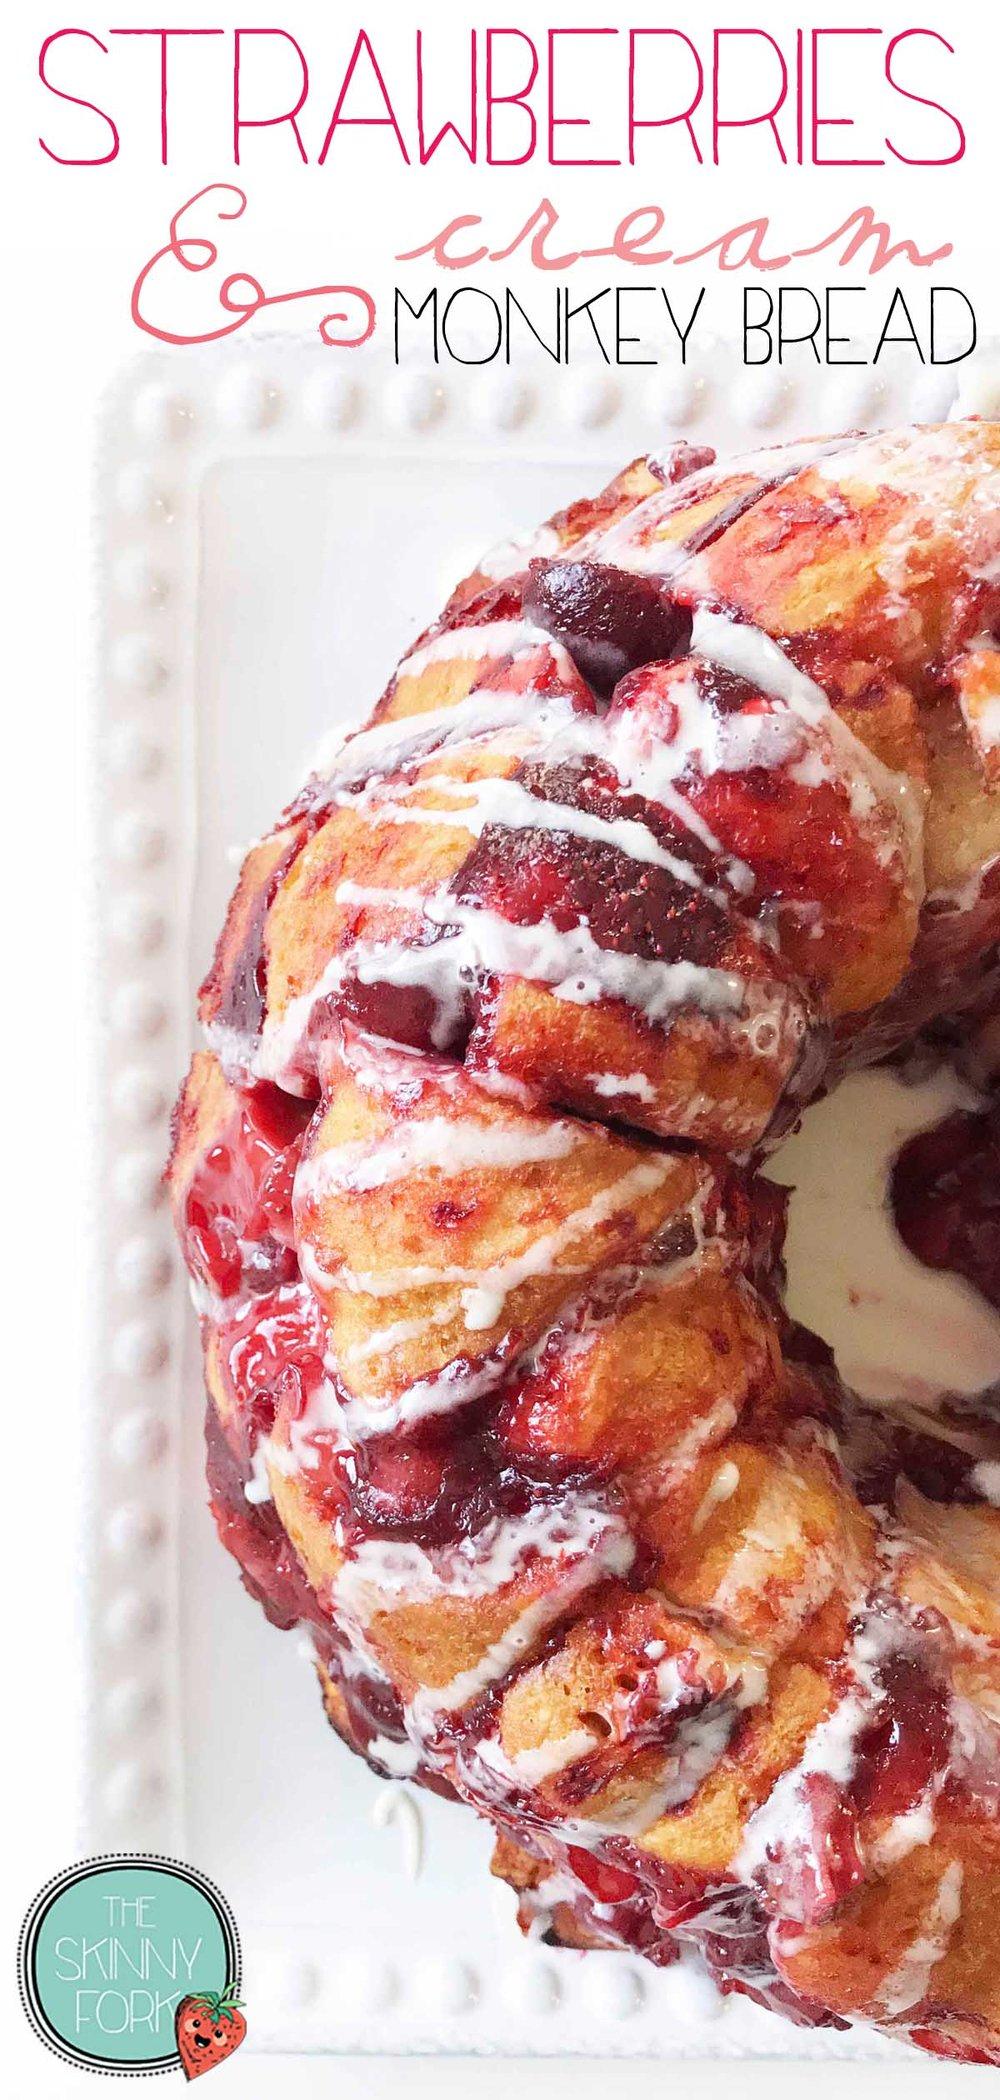 strawberry-monkey-bread-pin.jpg